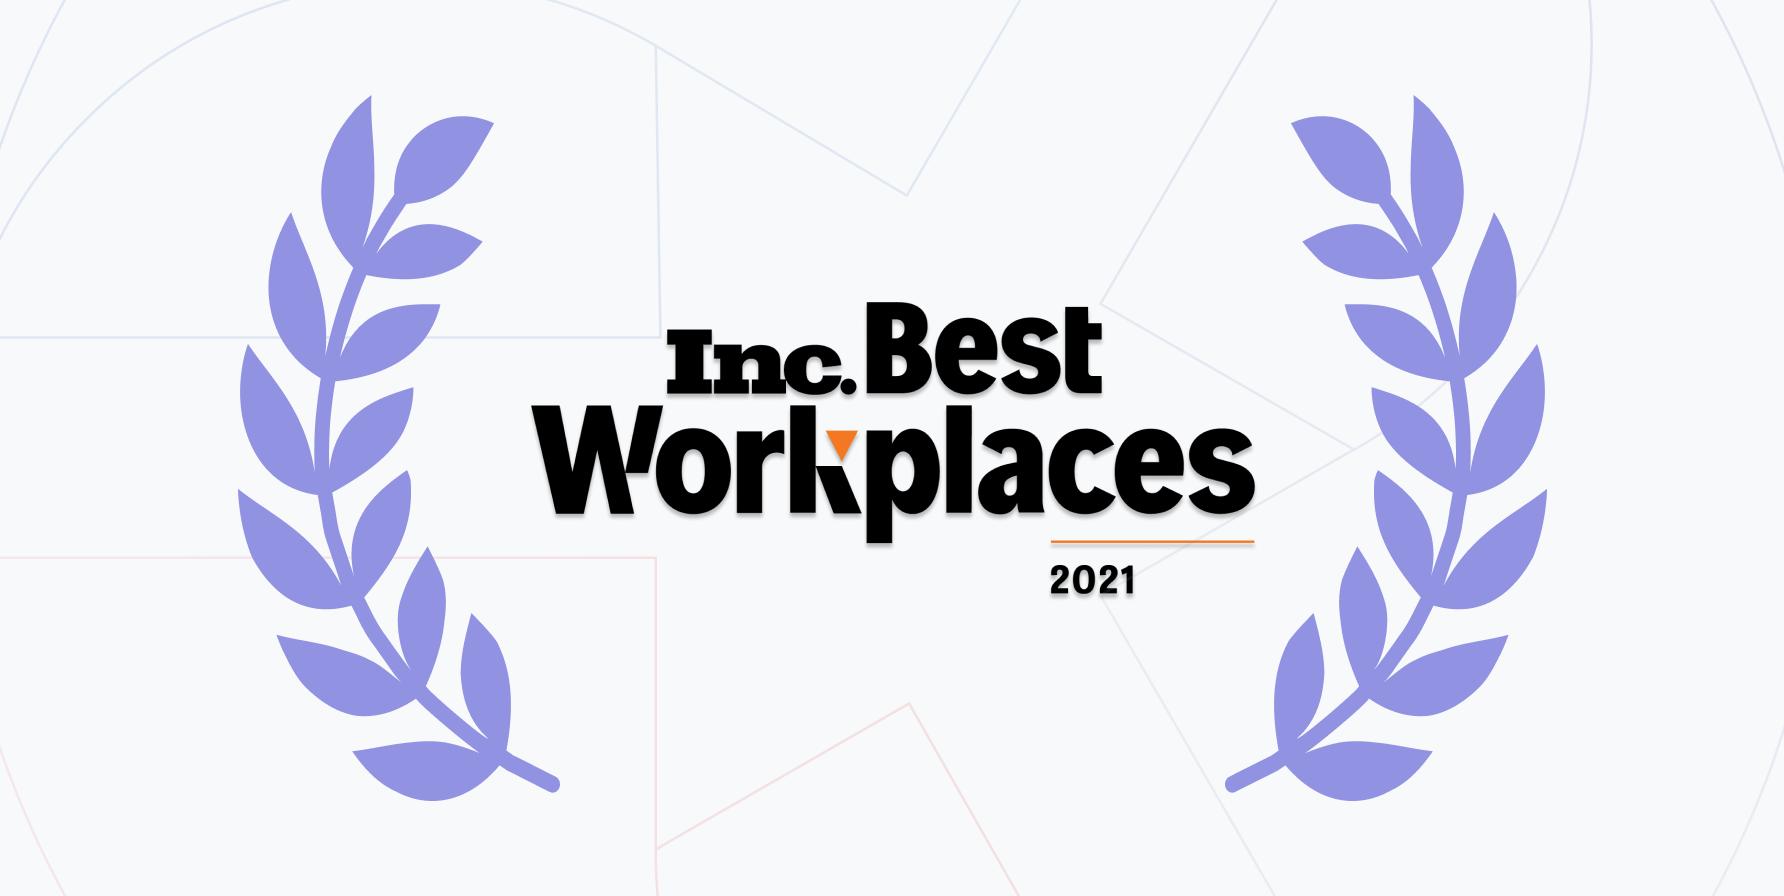 BillGO Makes Another 'Best Workplace' List